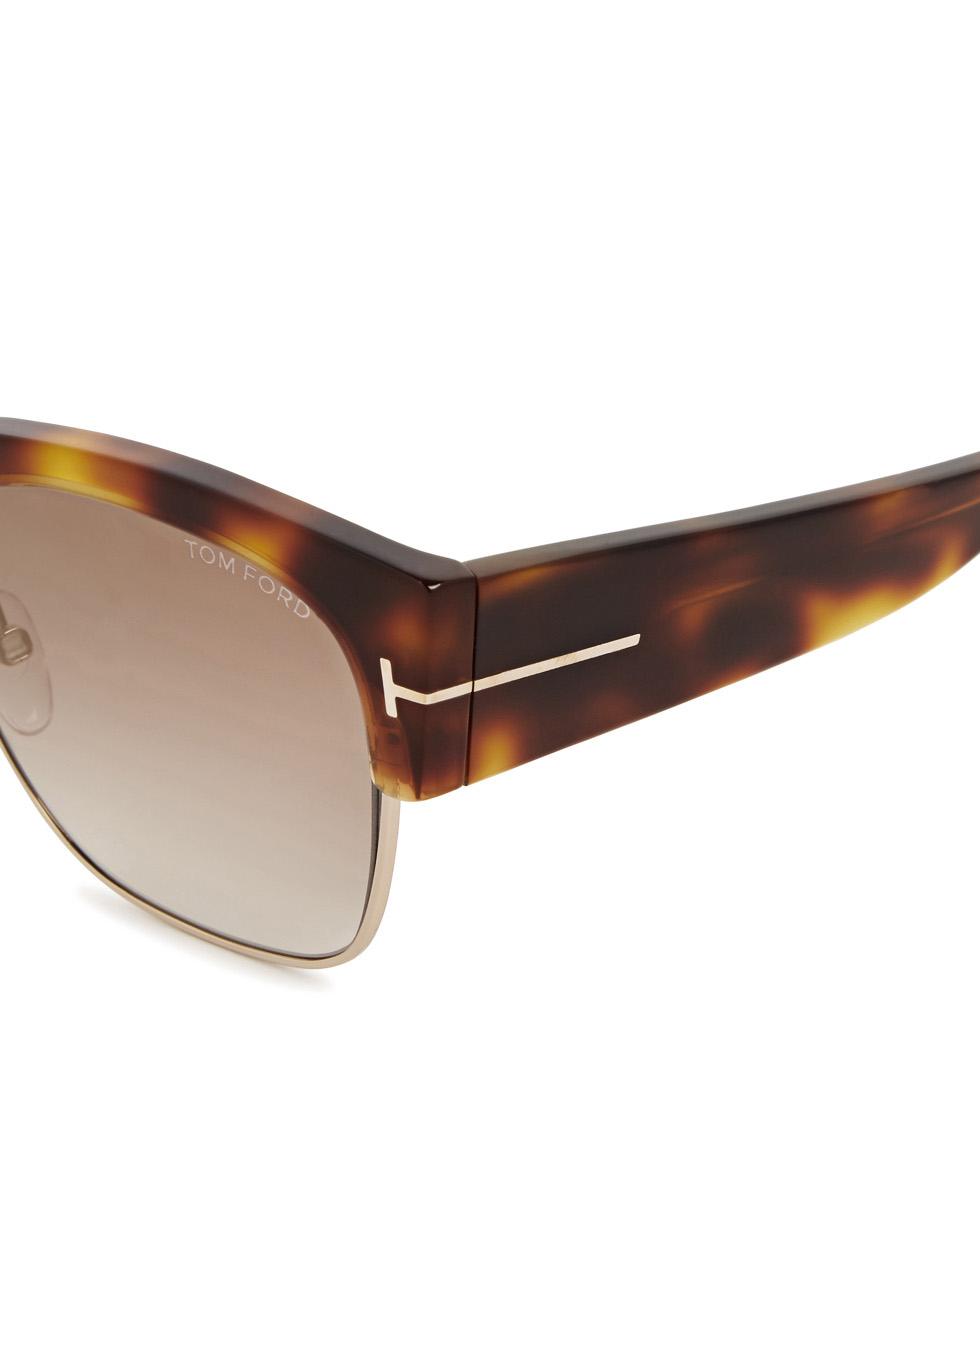 Dakota tortoiseshell clubmaster-style sunglasses - Tom Ford Eyewear